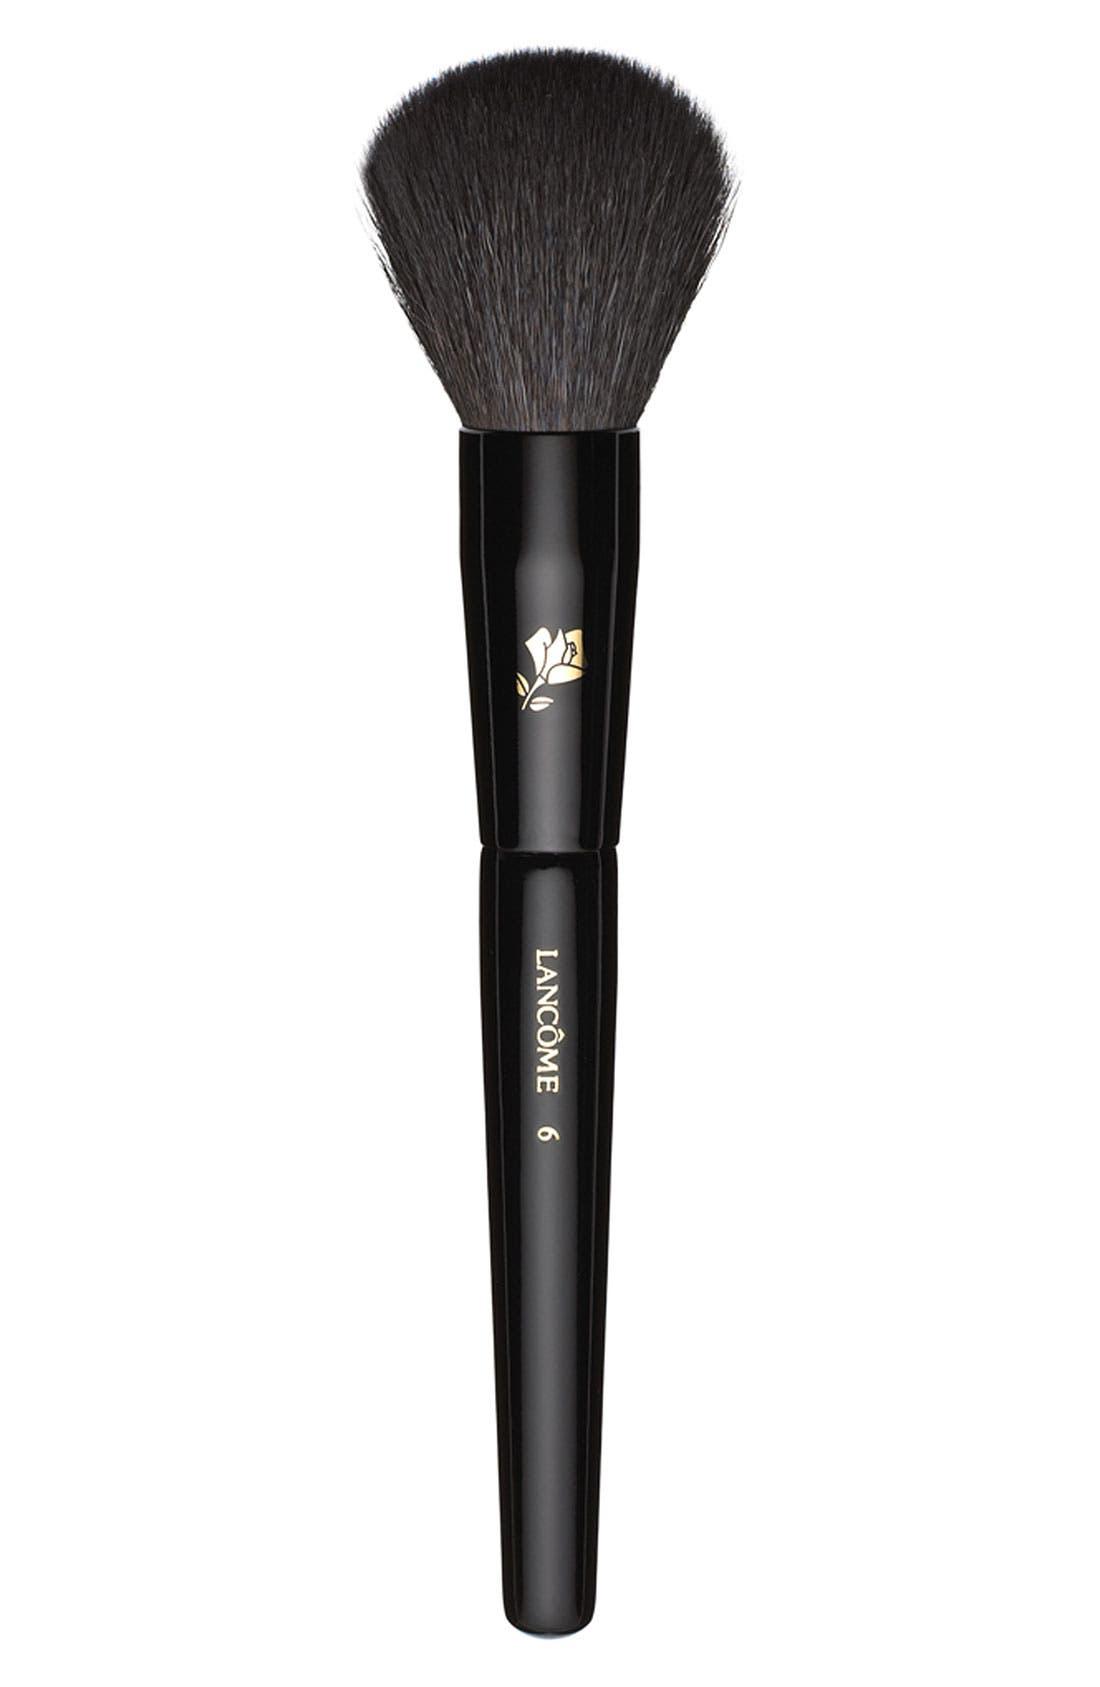 Lancôme Natural Bristled Blush Brush